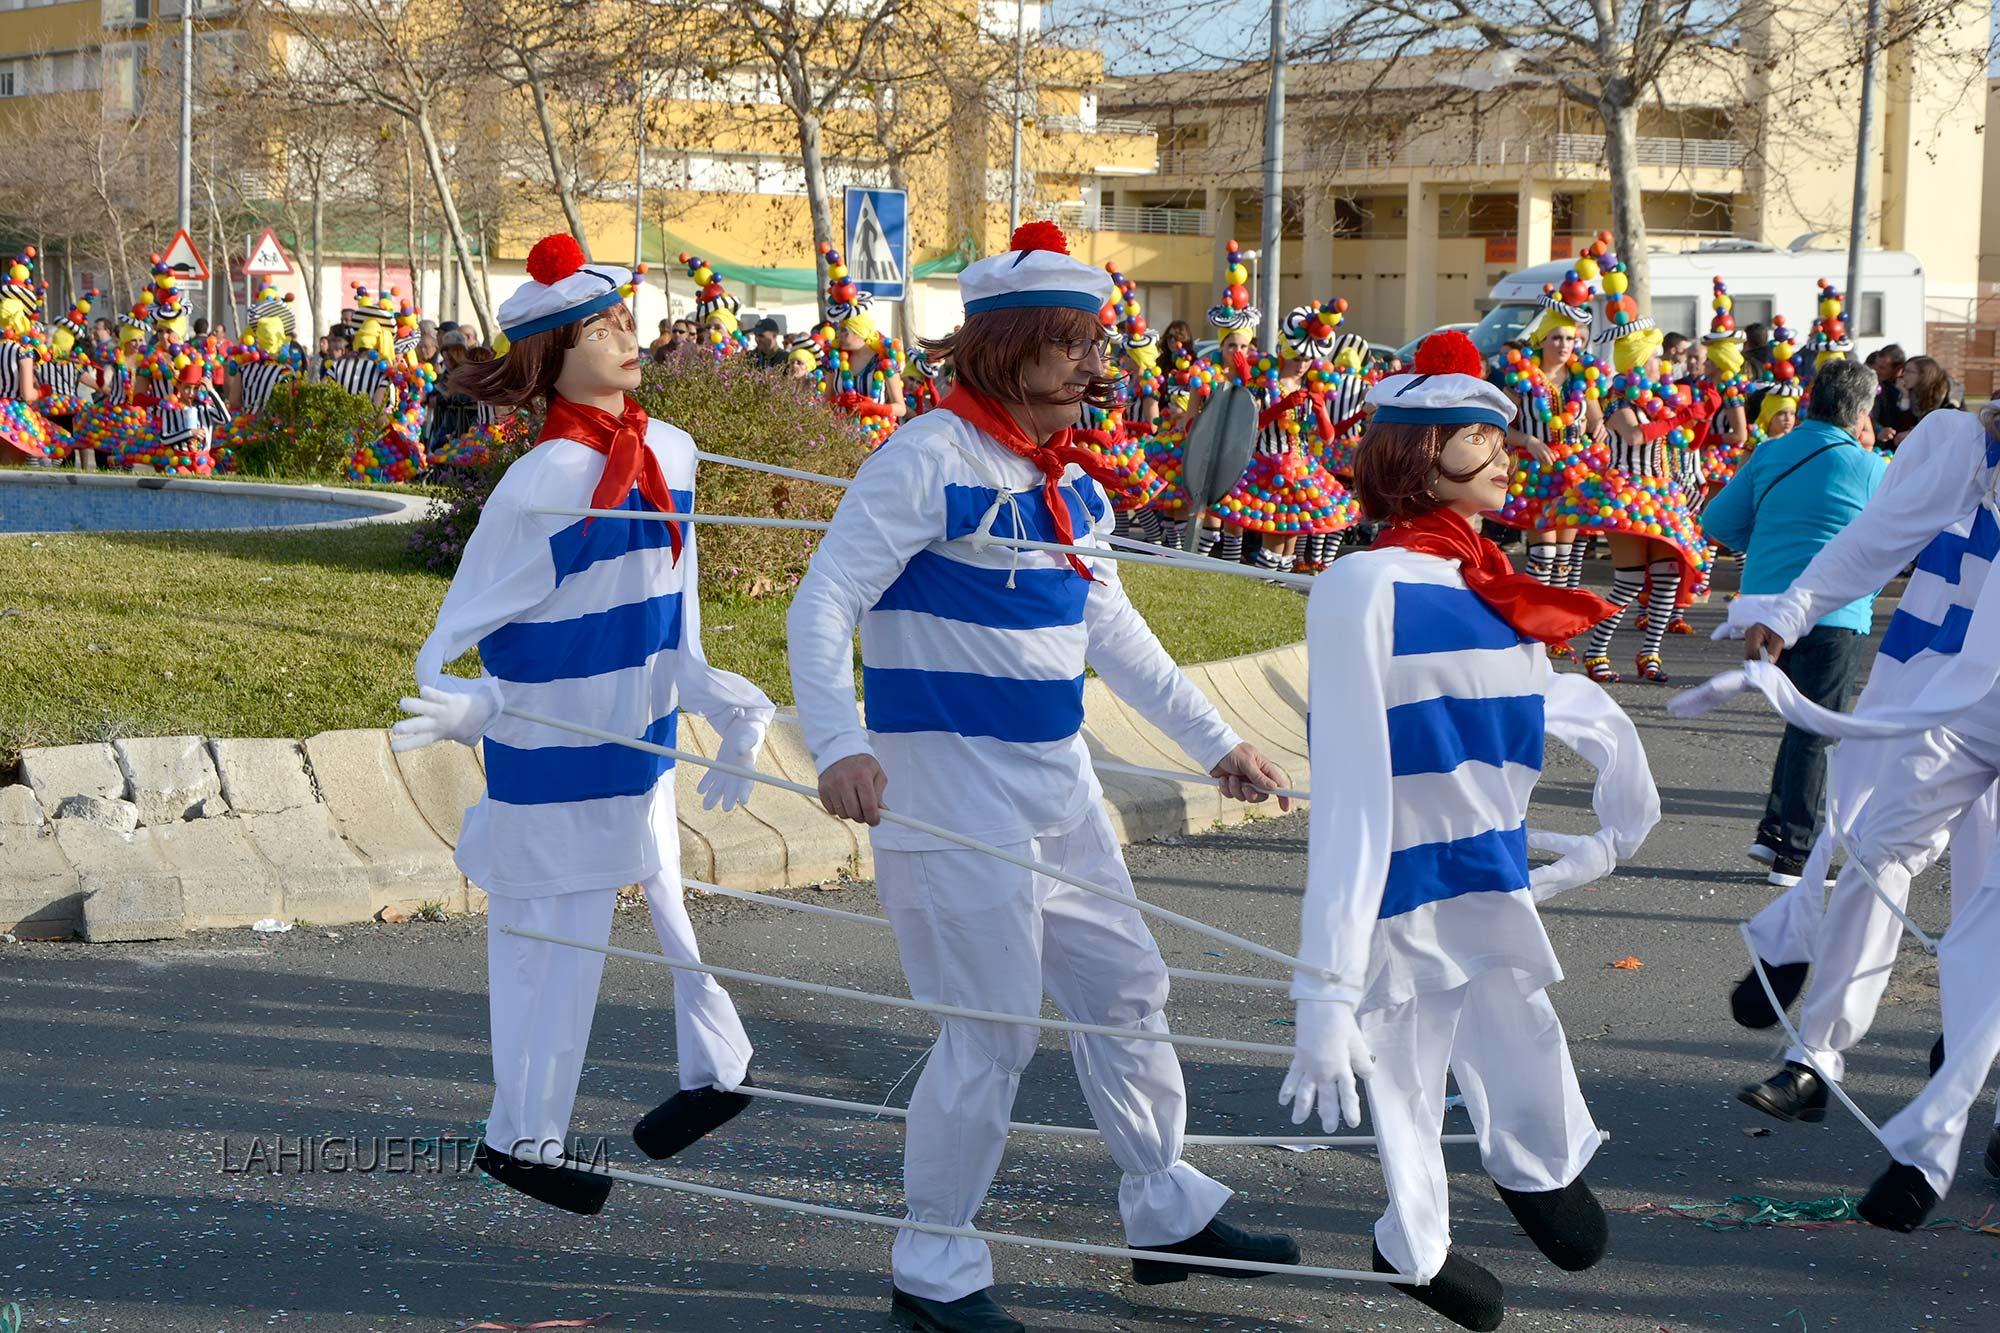 cabalgata carnaval isla cristina _DSC0612